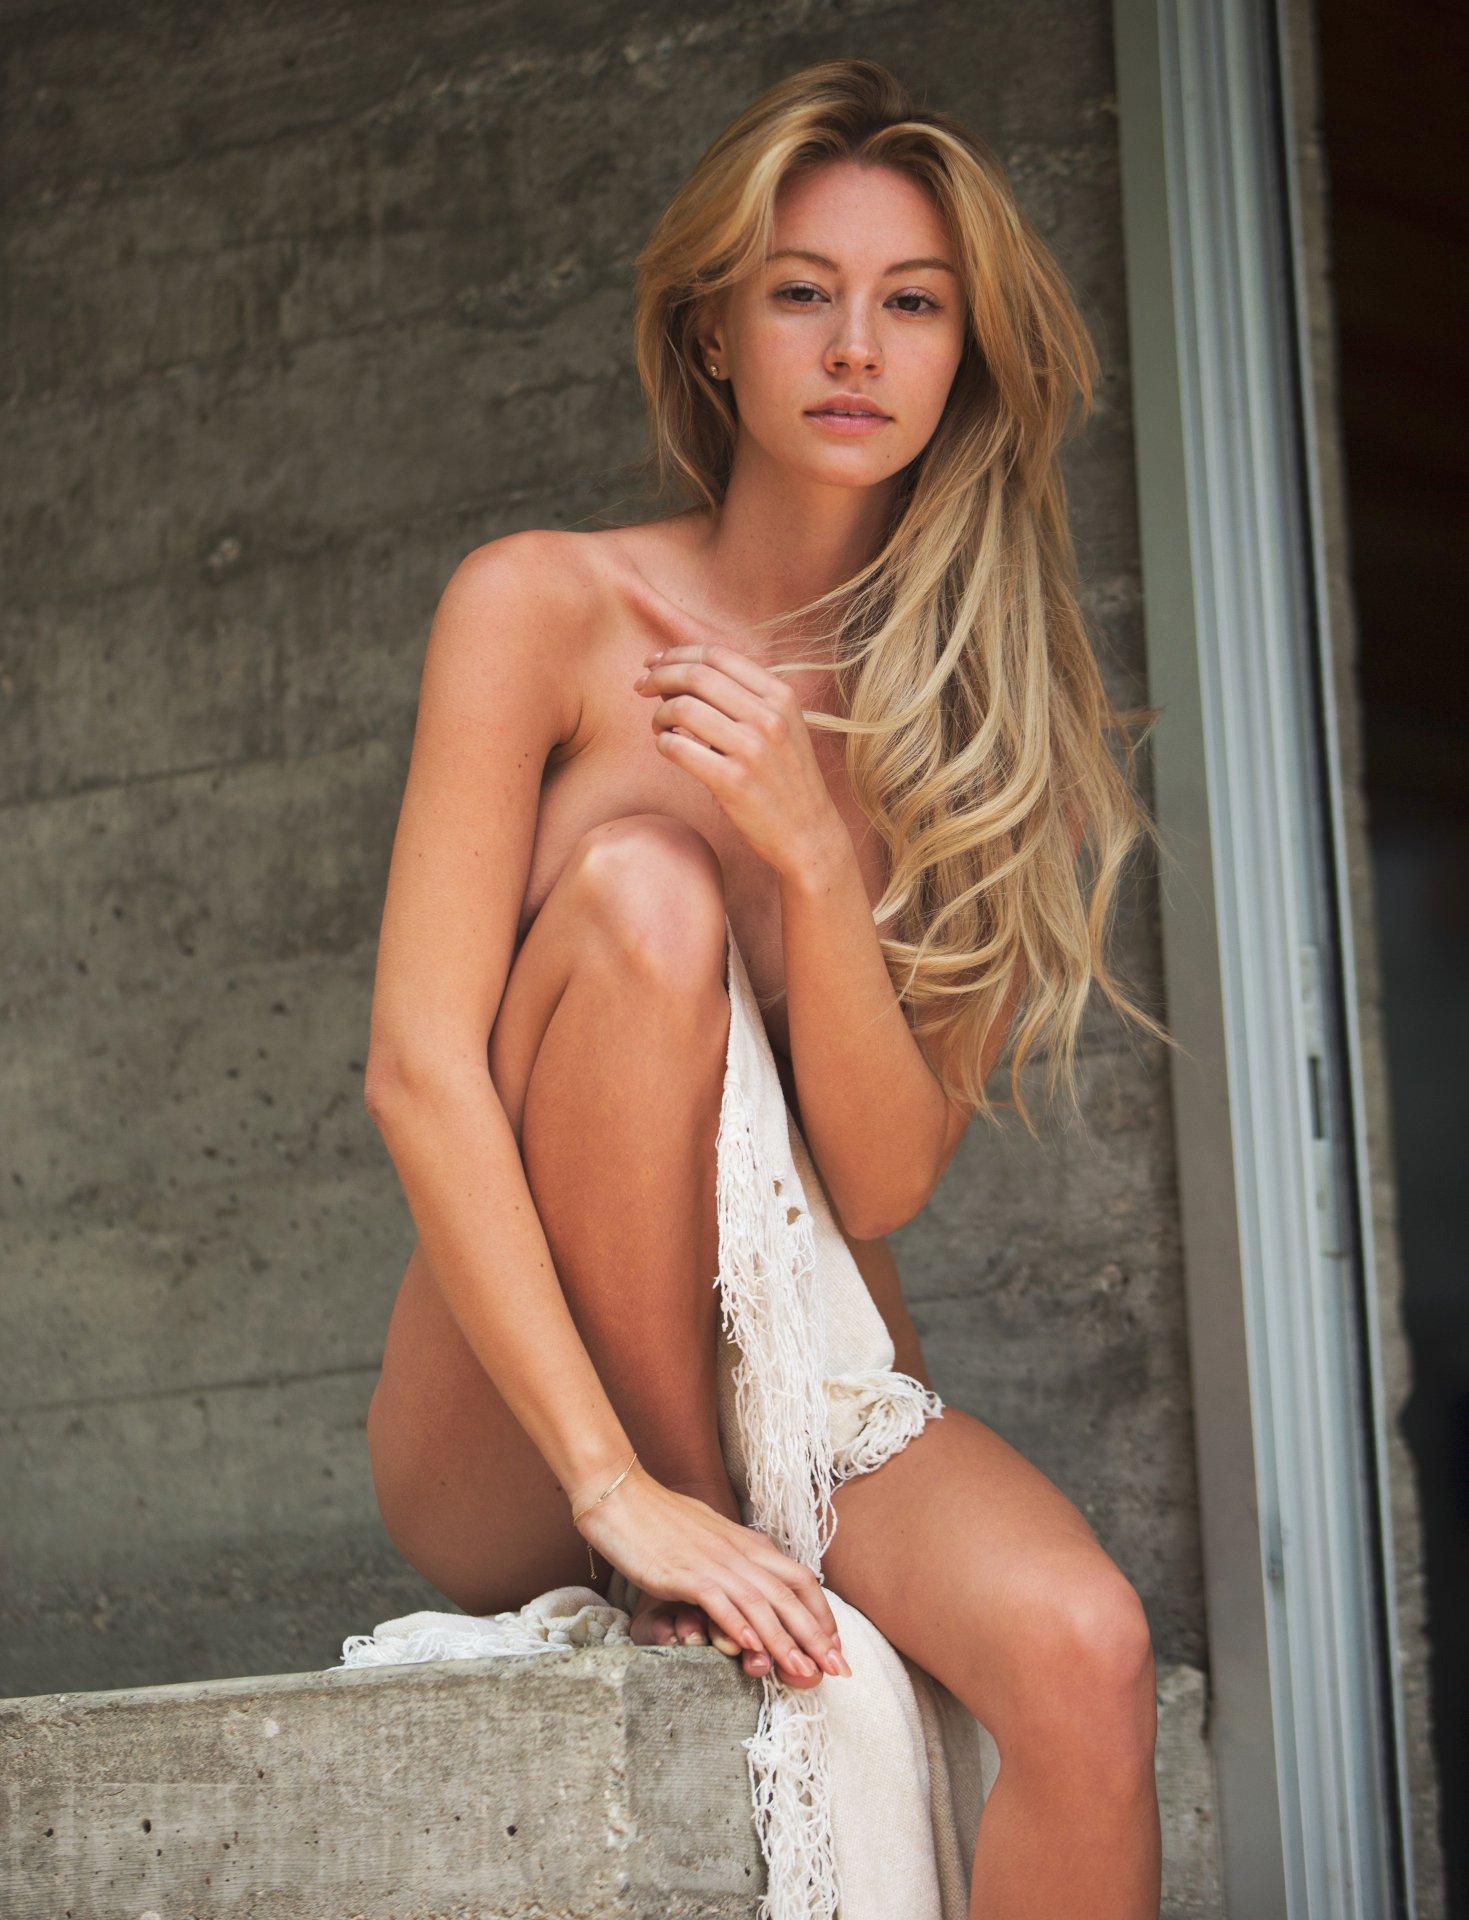 Fuck Bryana Holly naked (27 photos), Pussy, Bikini, Selfie, see through 2015